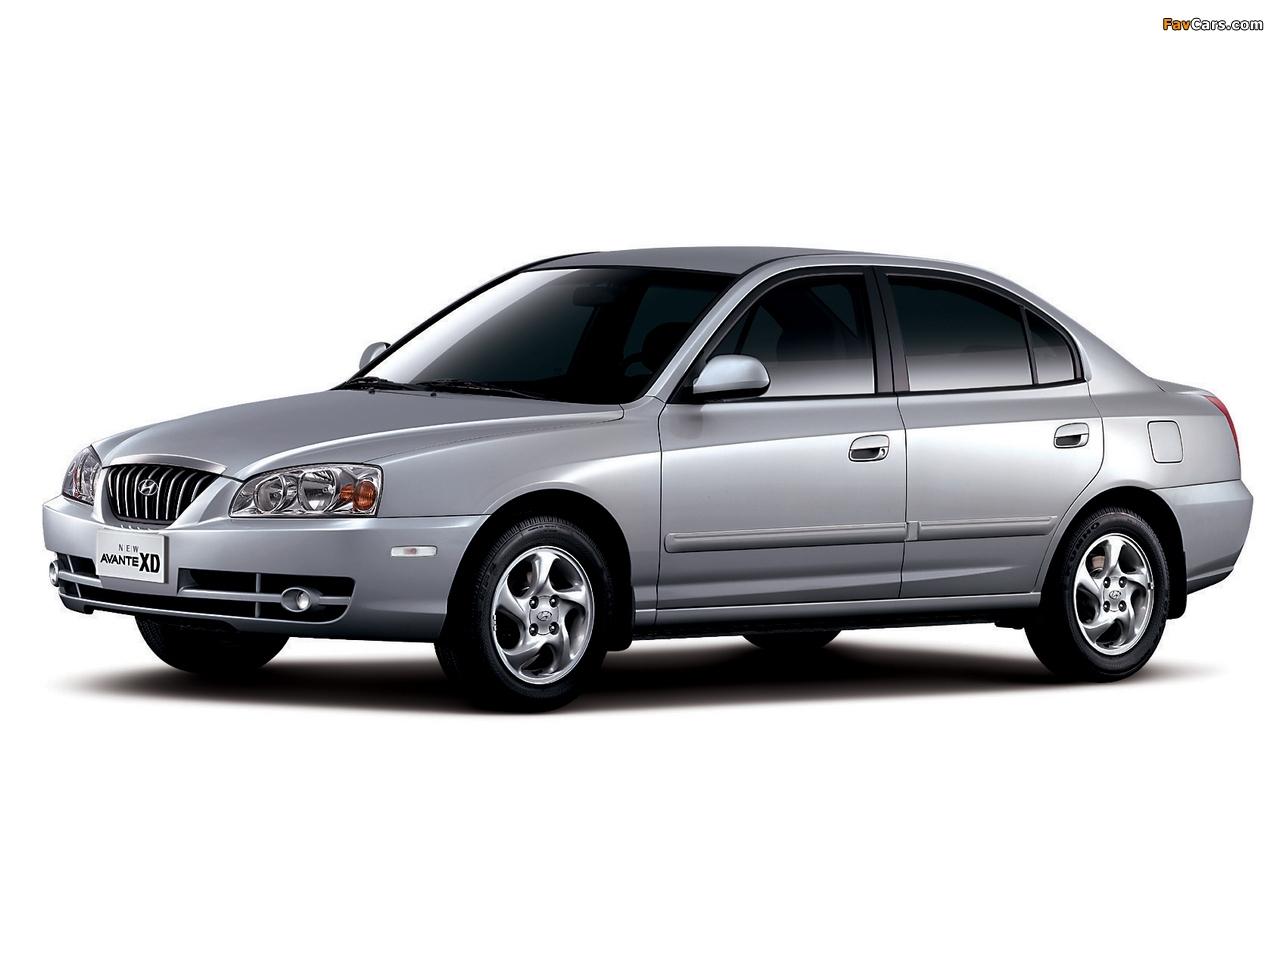 Hyundai Avante Xd 2003 06 Photos 1280x960